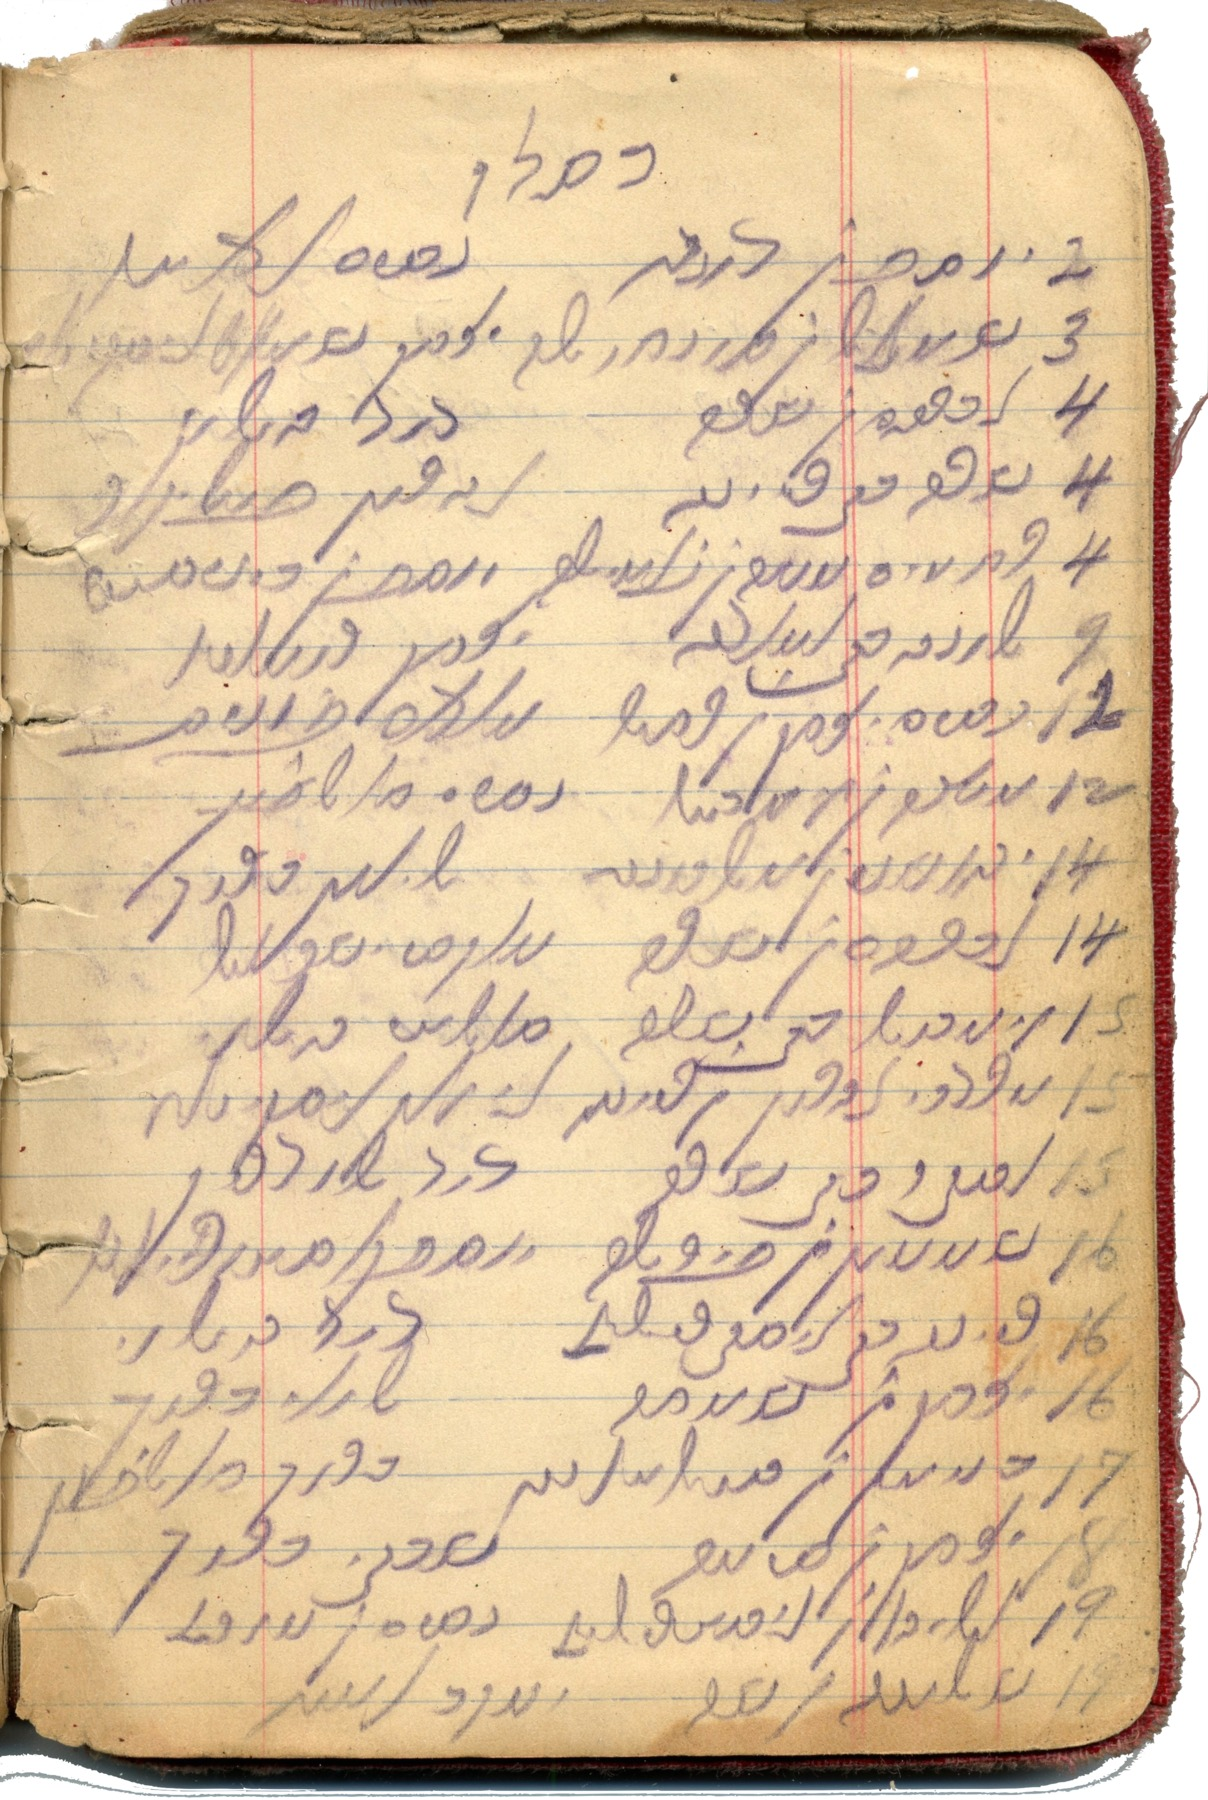 Reverend Morris Scharhon's Book of Meldados